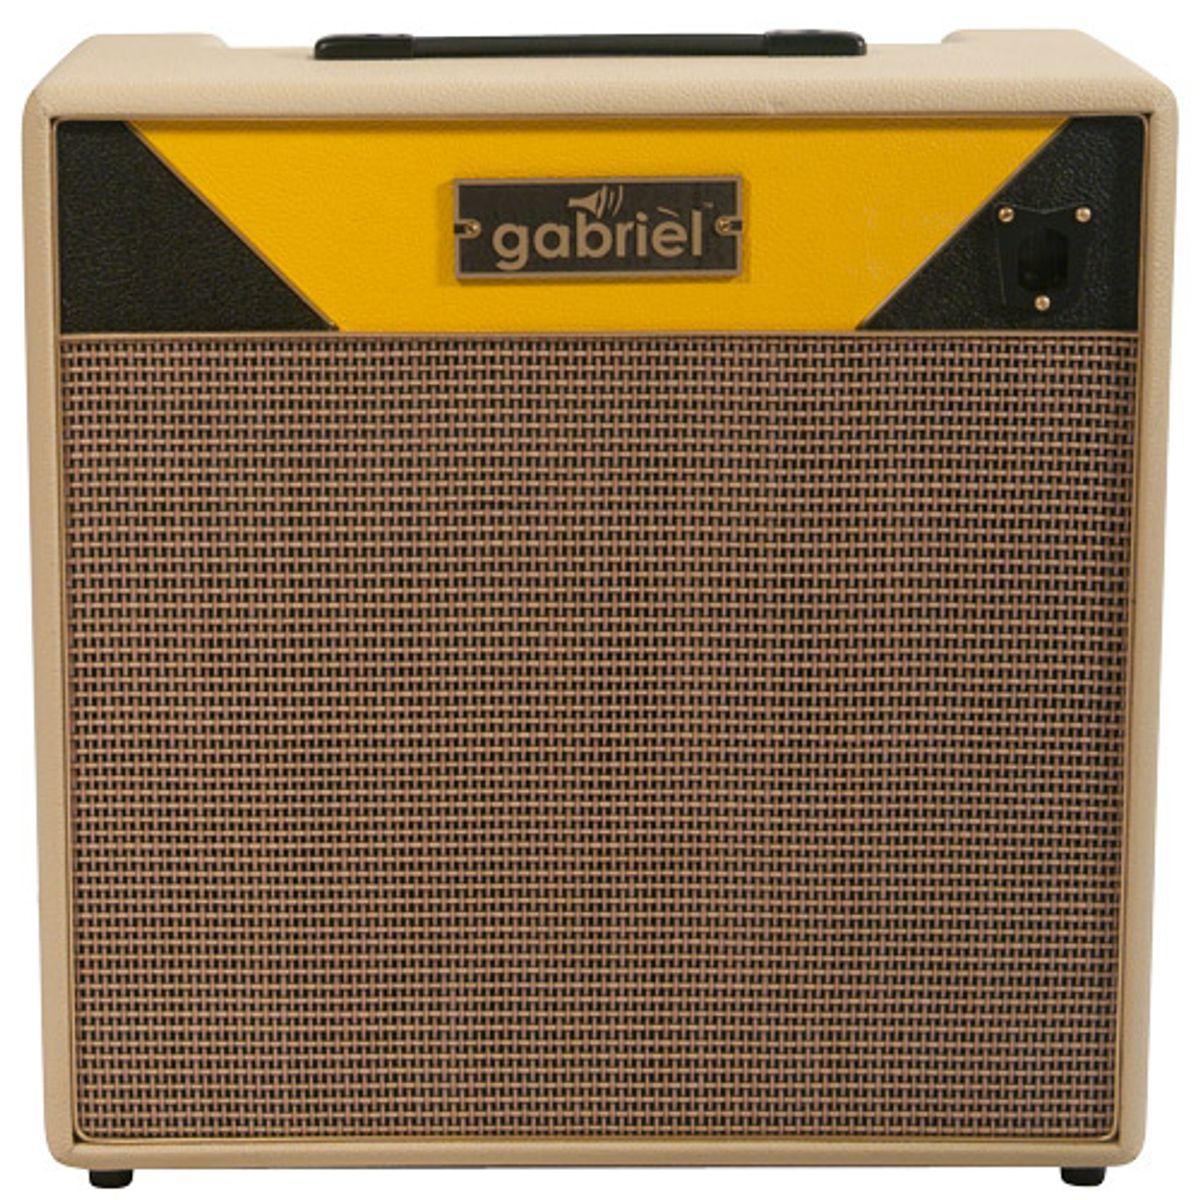 Gabriel Stinger Amp Review